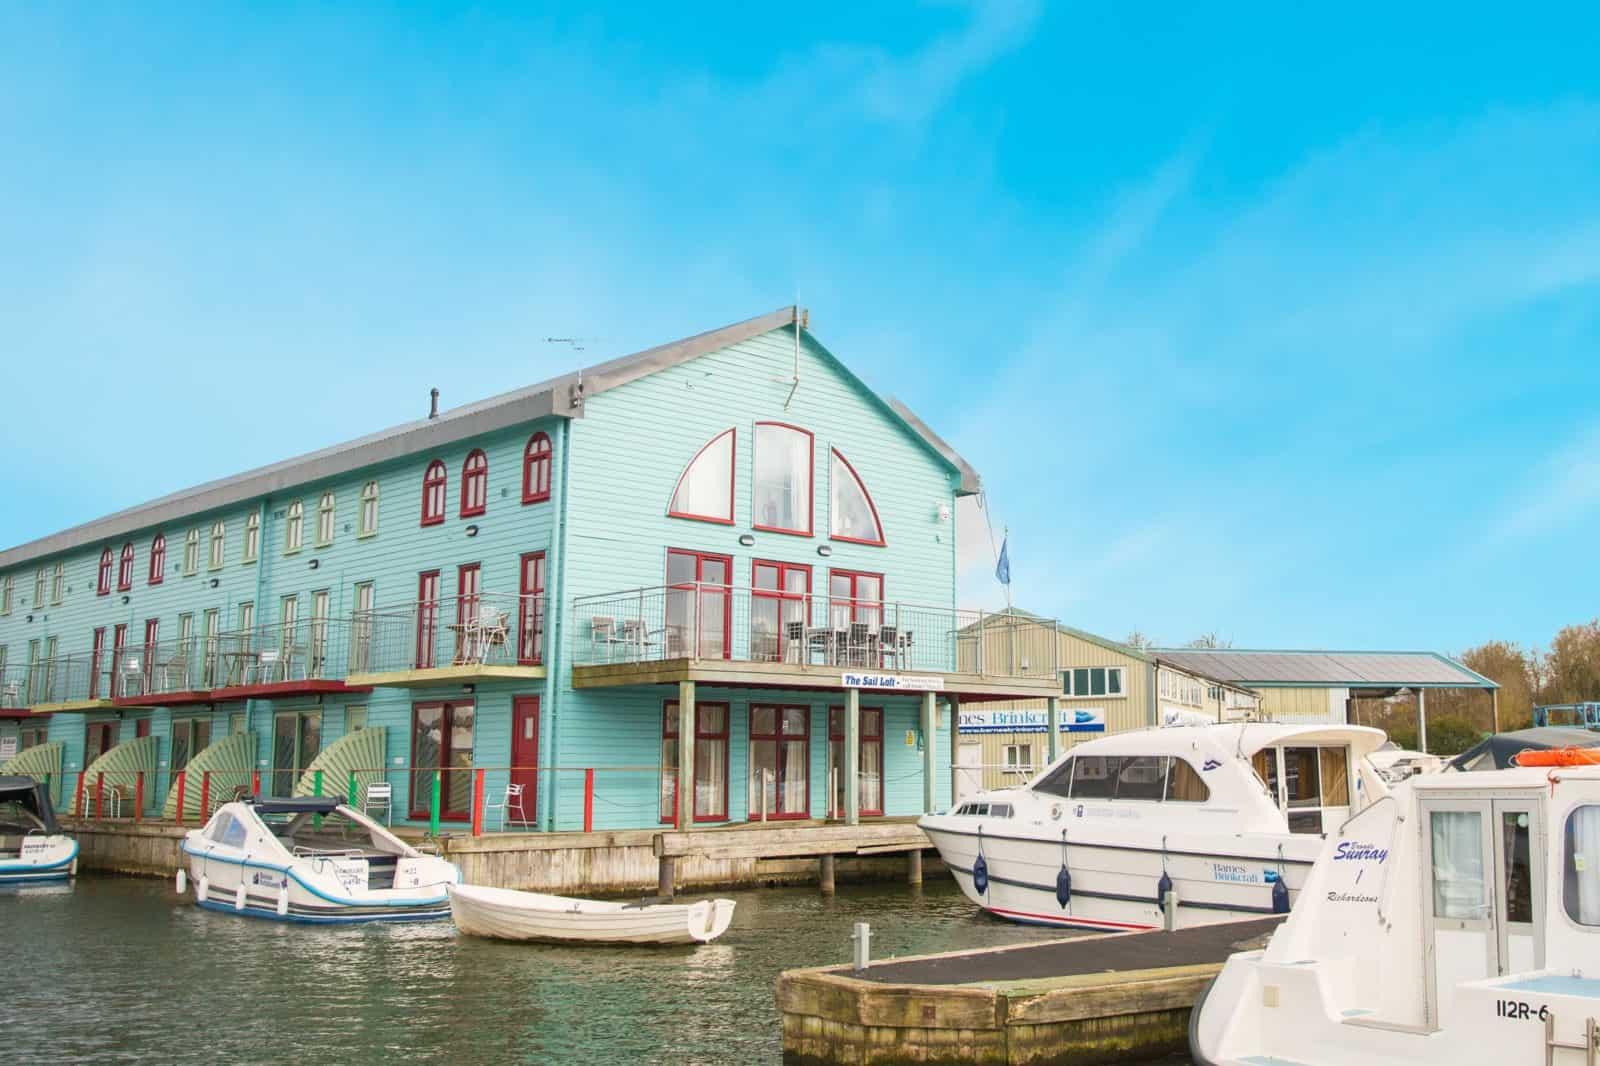 Sail Loft Holiday Cottage Wroxham Norfolk Barnes Brinkcraft